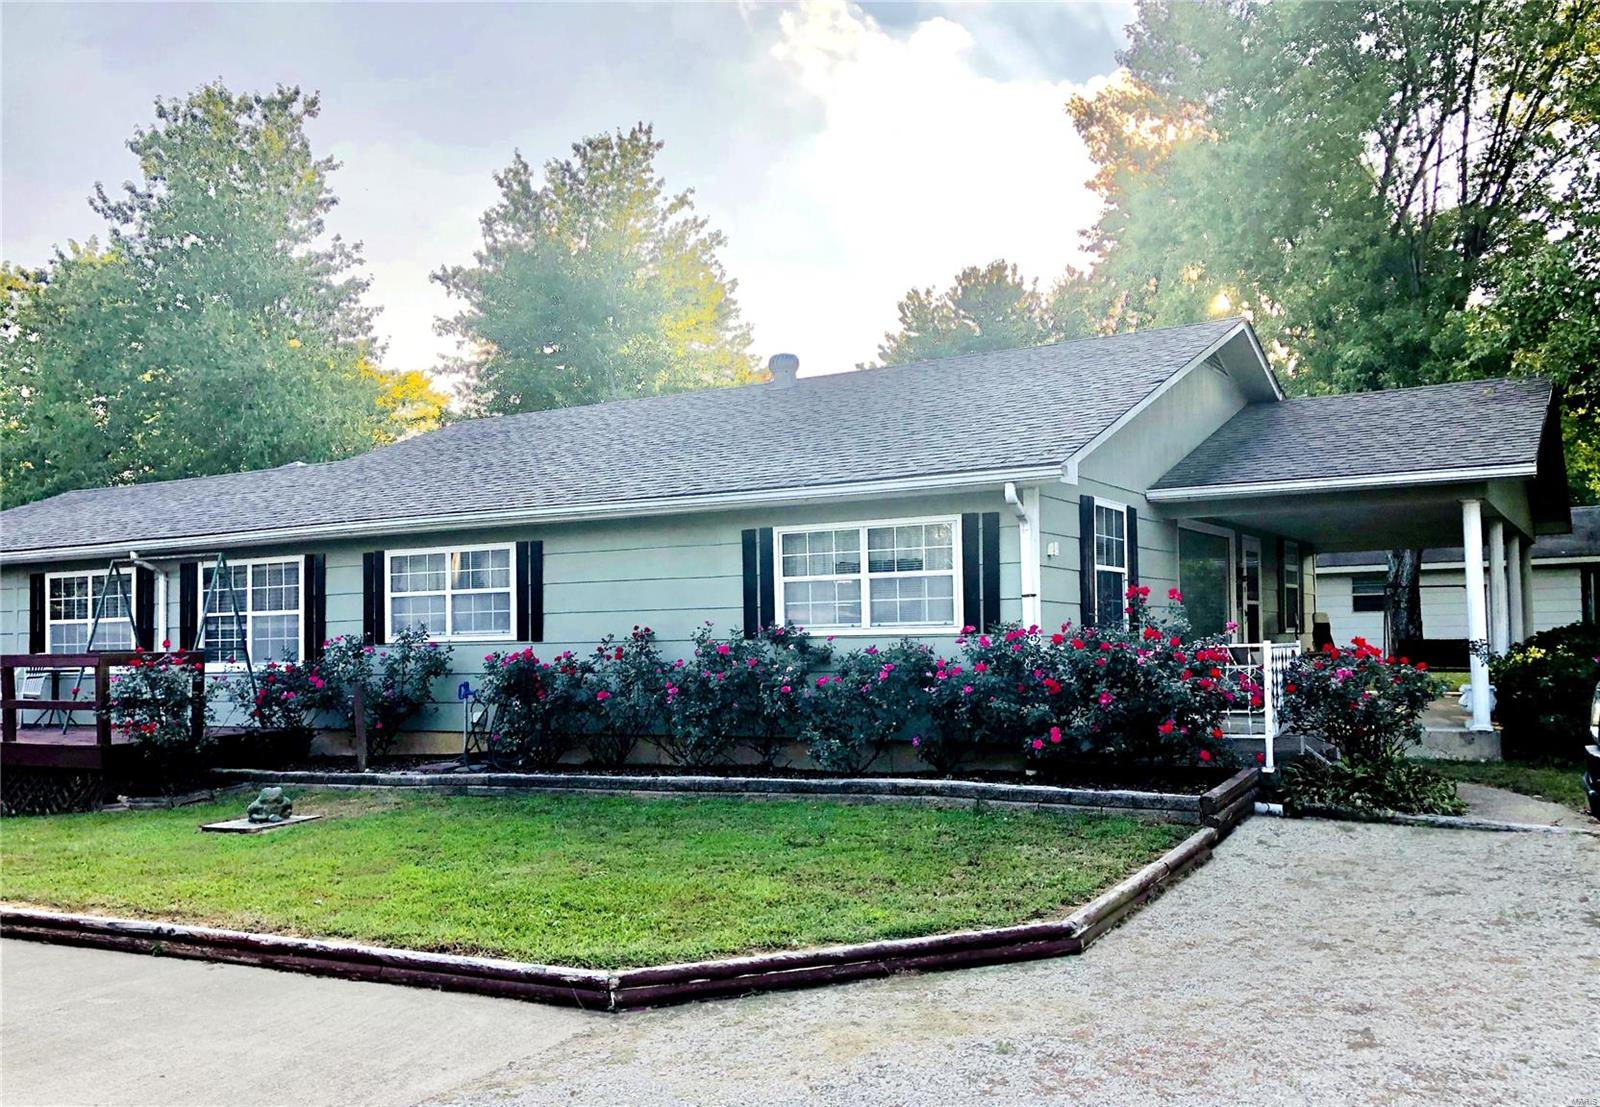 2400 Ripley 142-34 Property Photo - Doniphan, MO real estate listing